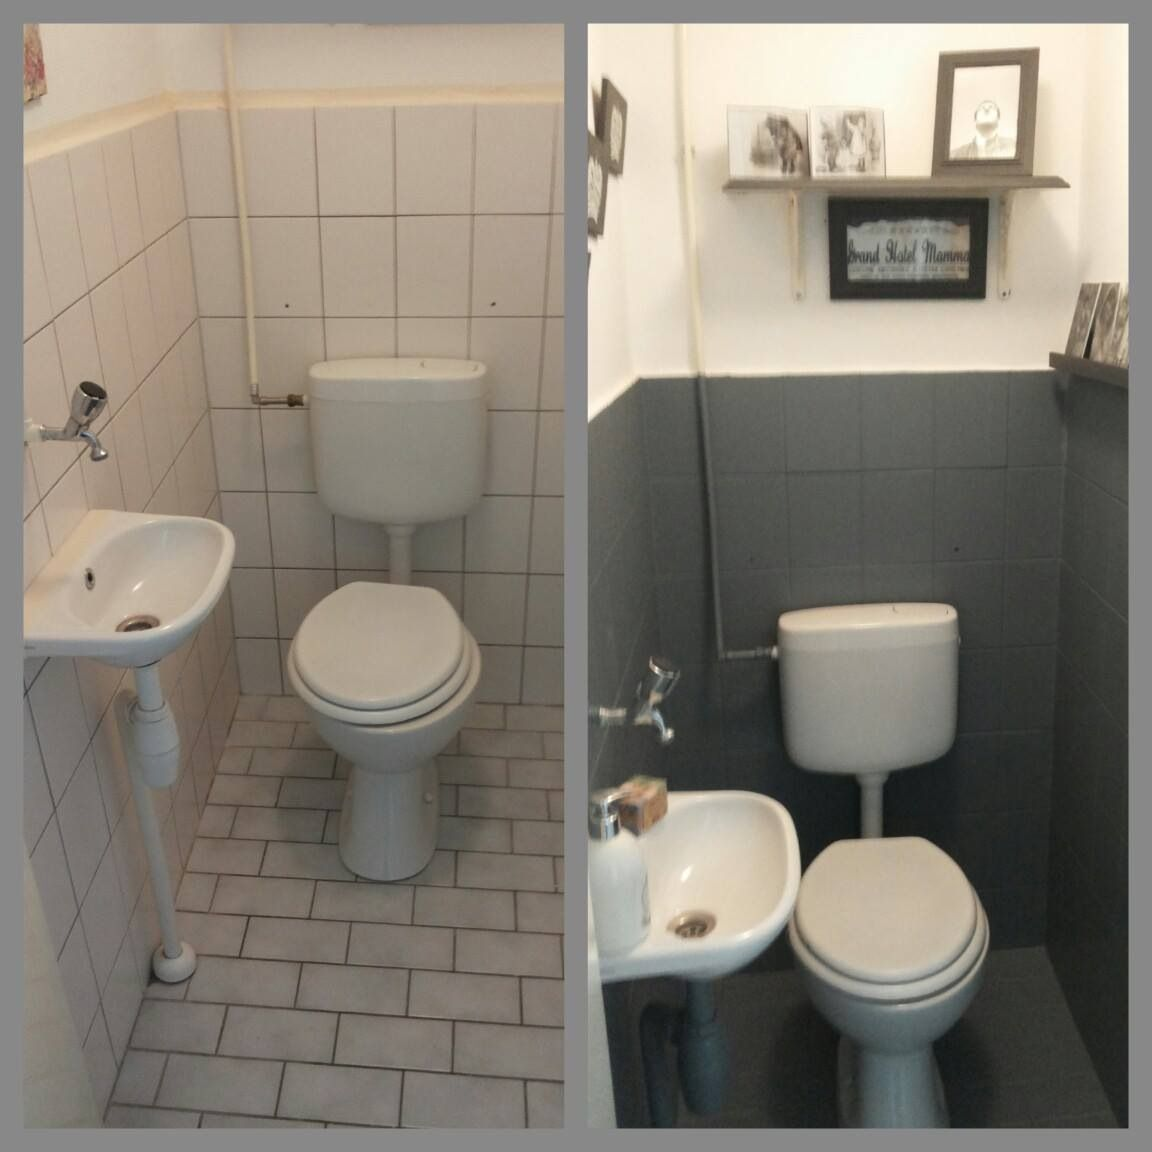 Toilet Badkamer Goedkoop Badkamer Opknappen Toiletruimte